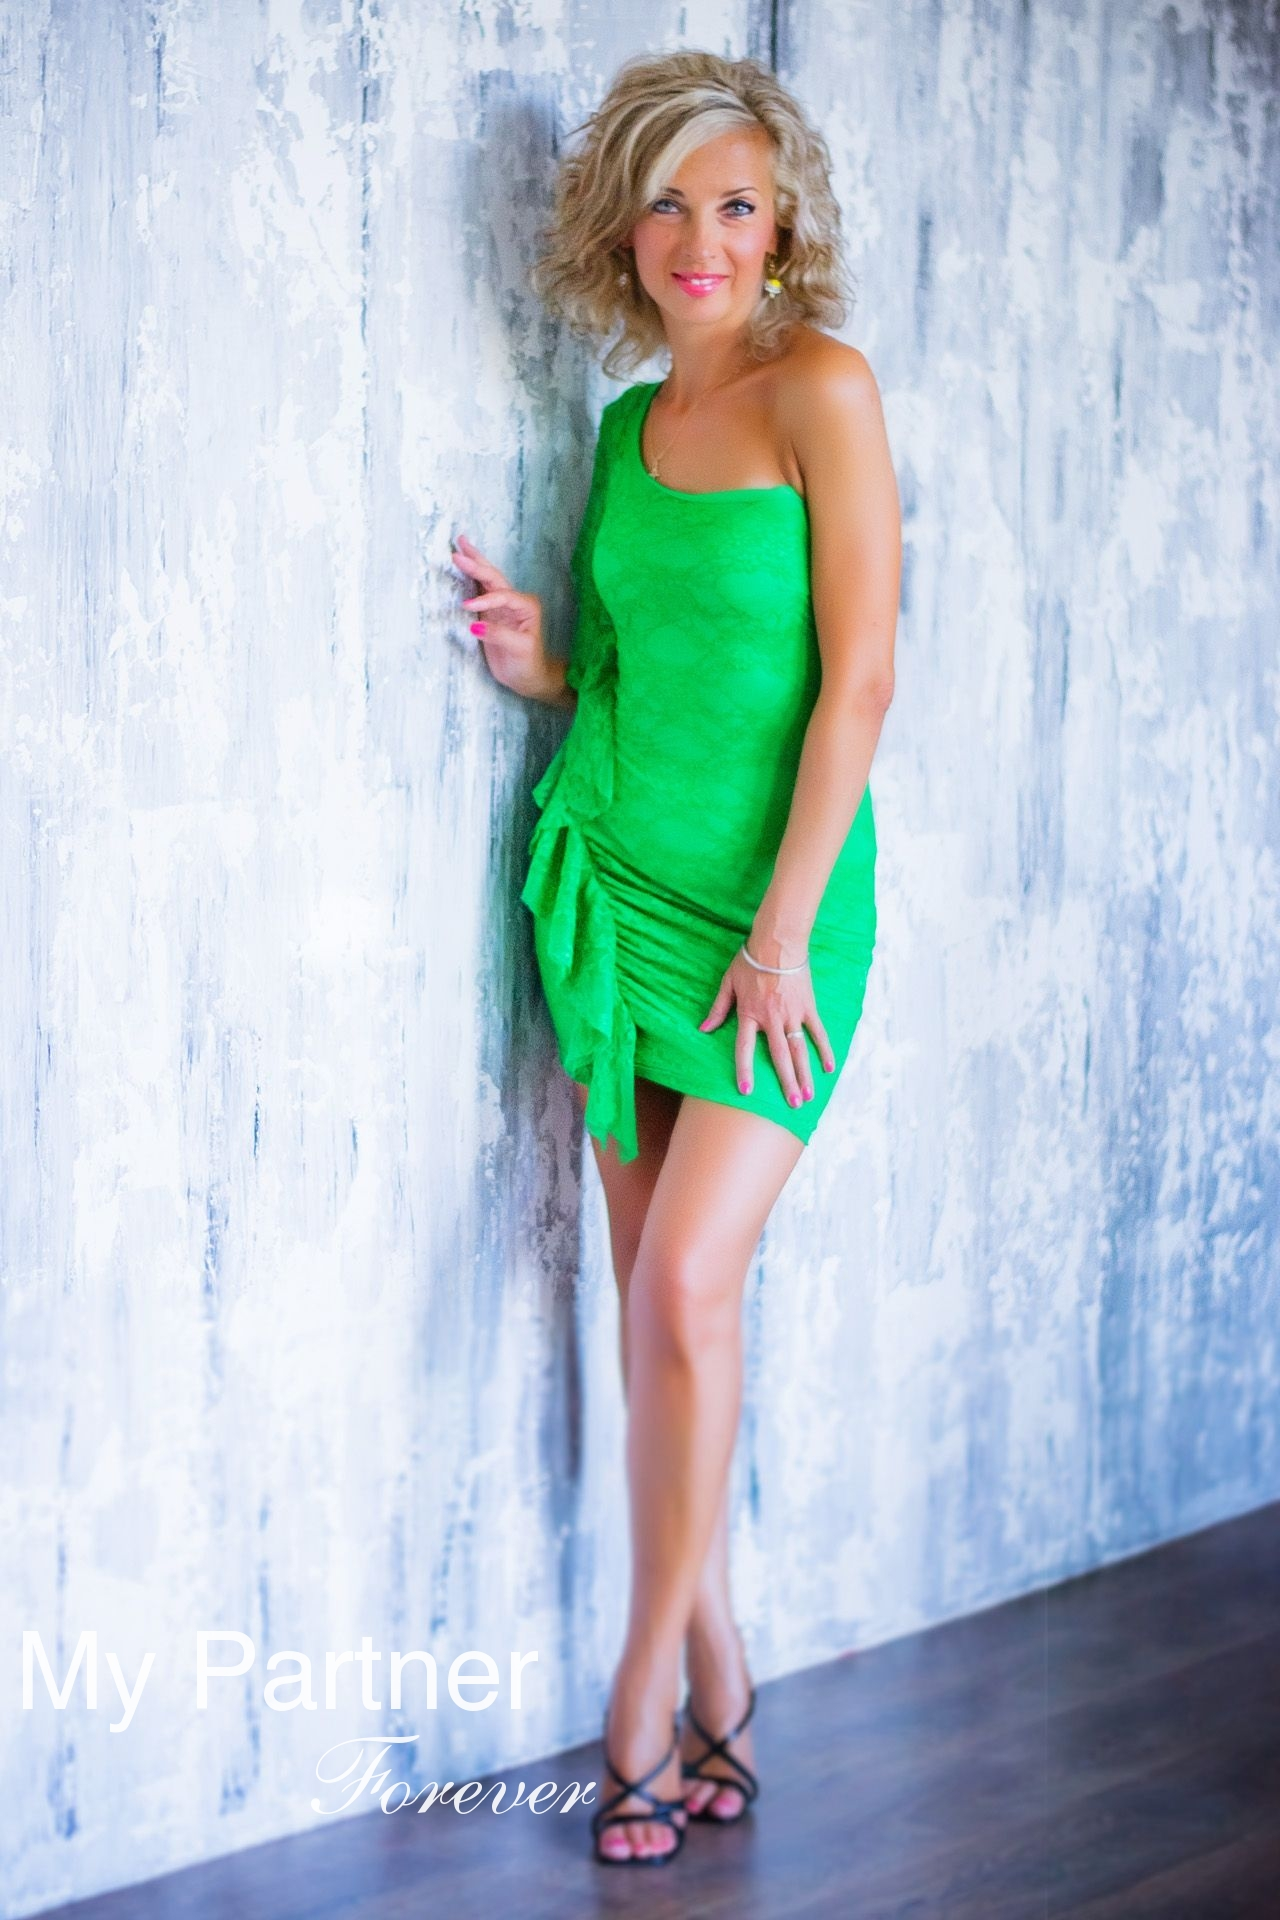 Meet Charming Ukrainian Woman Tatiyana from Dniepropetrovsk, Ukraine